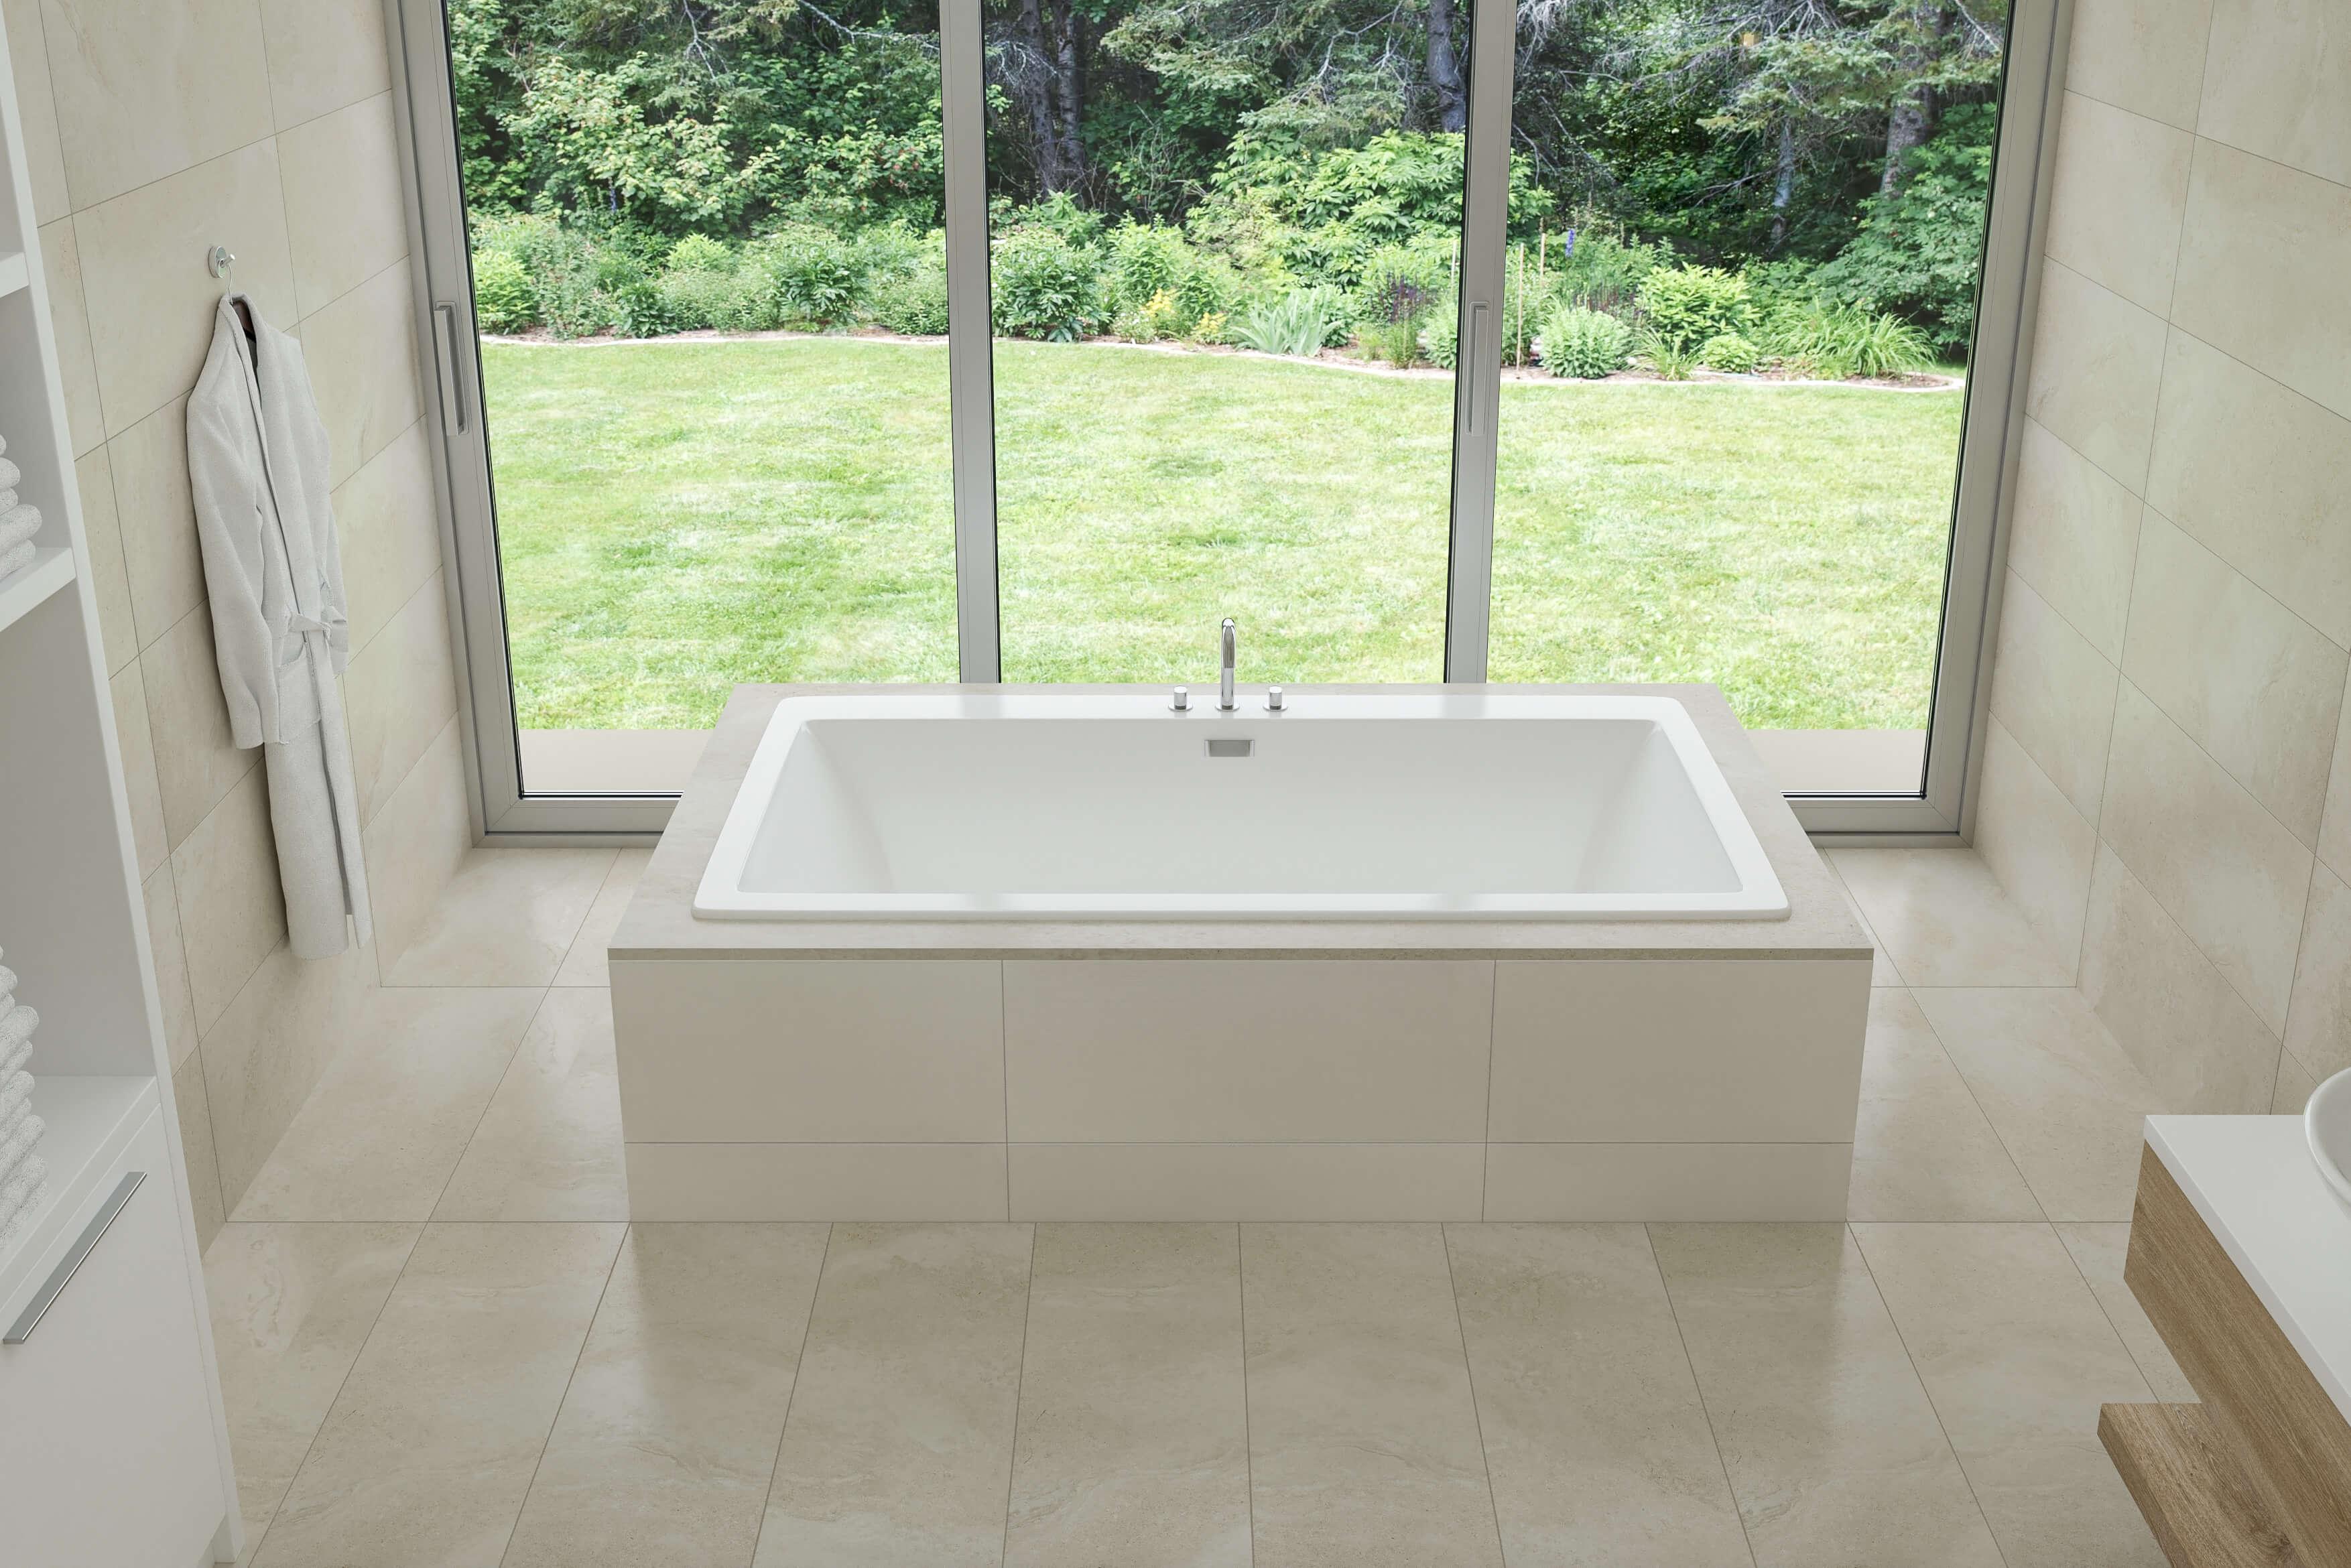 Cool Kohler Villager Bathtub Gallery - Bathtub Design Ideas - valtak.com